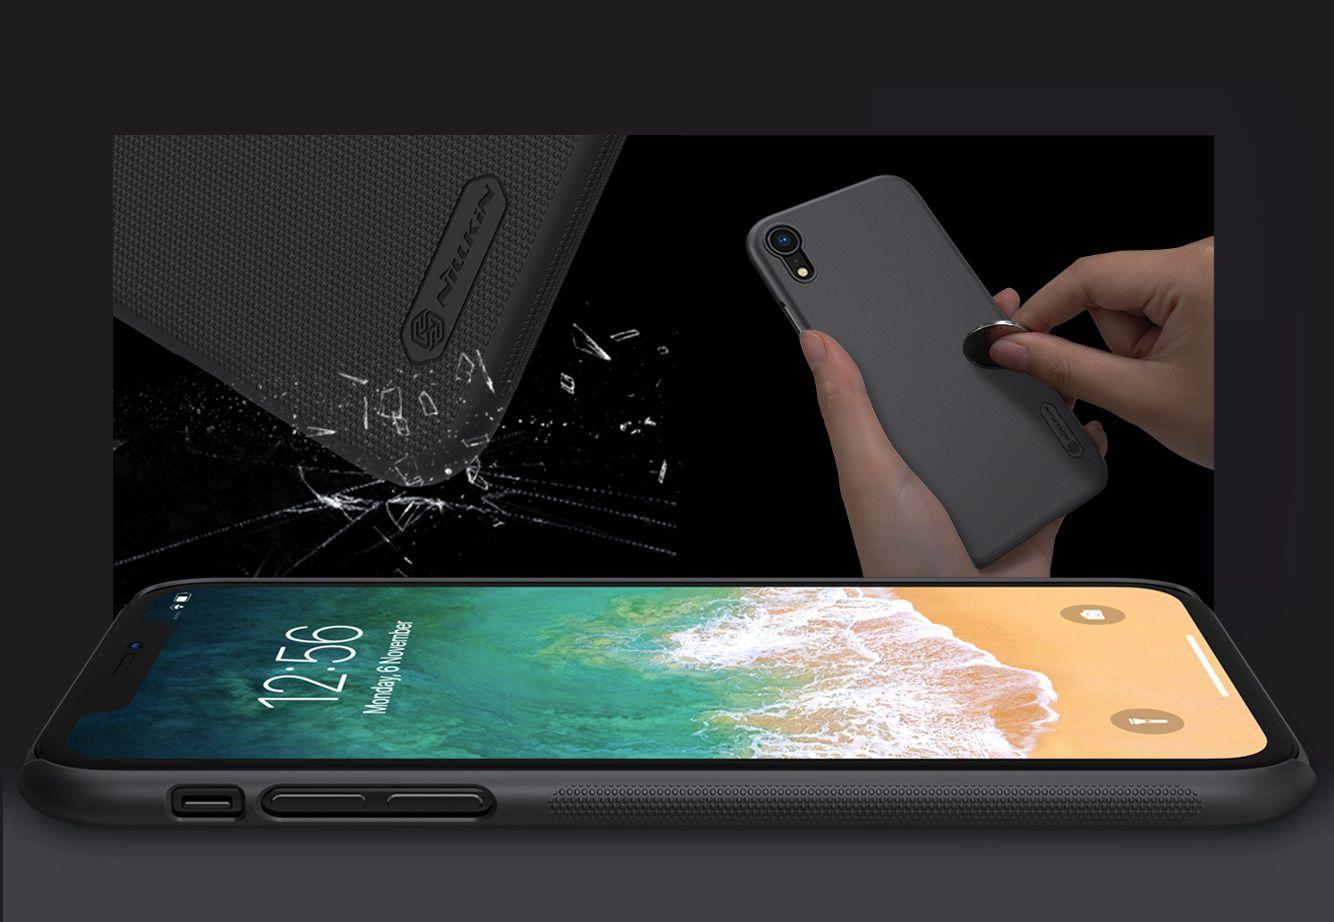 Capinha Capa Case Nillkin Iphone XR Super Frosted Shield - Sem Furo